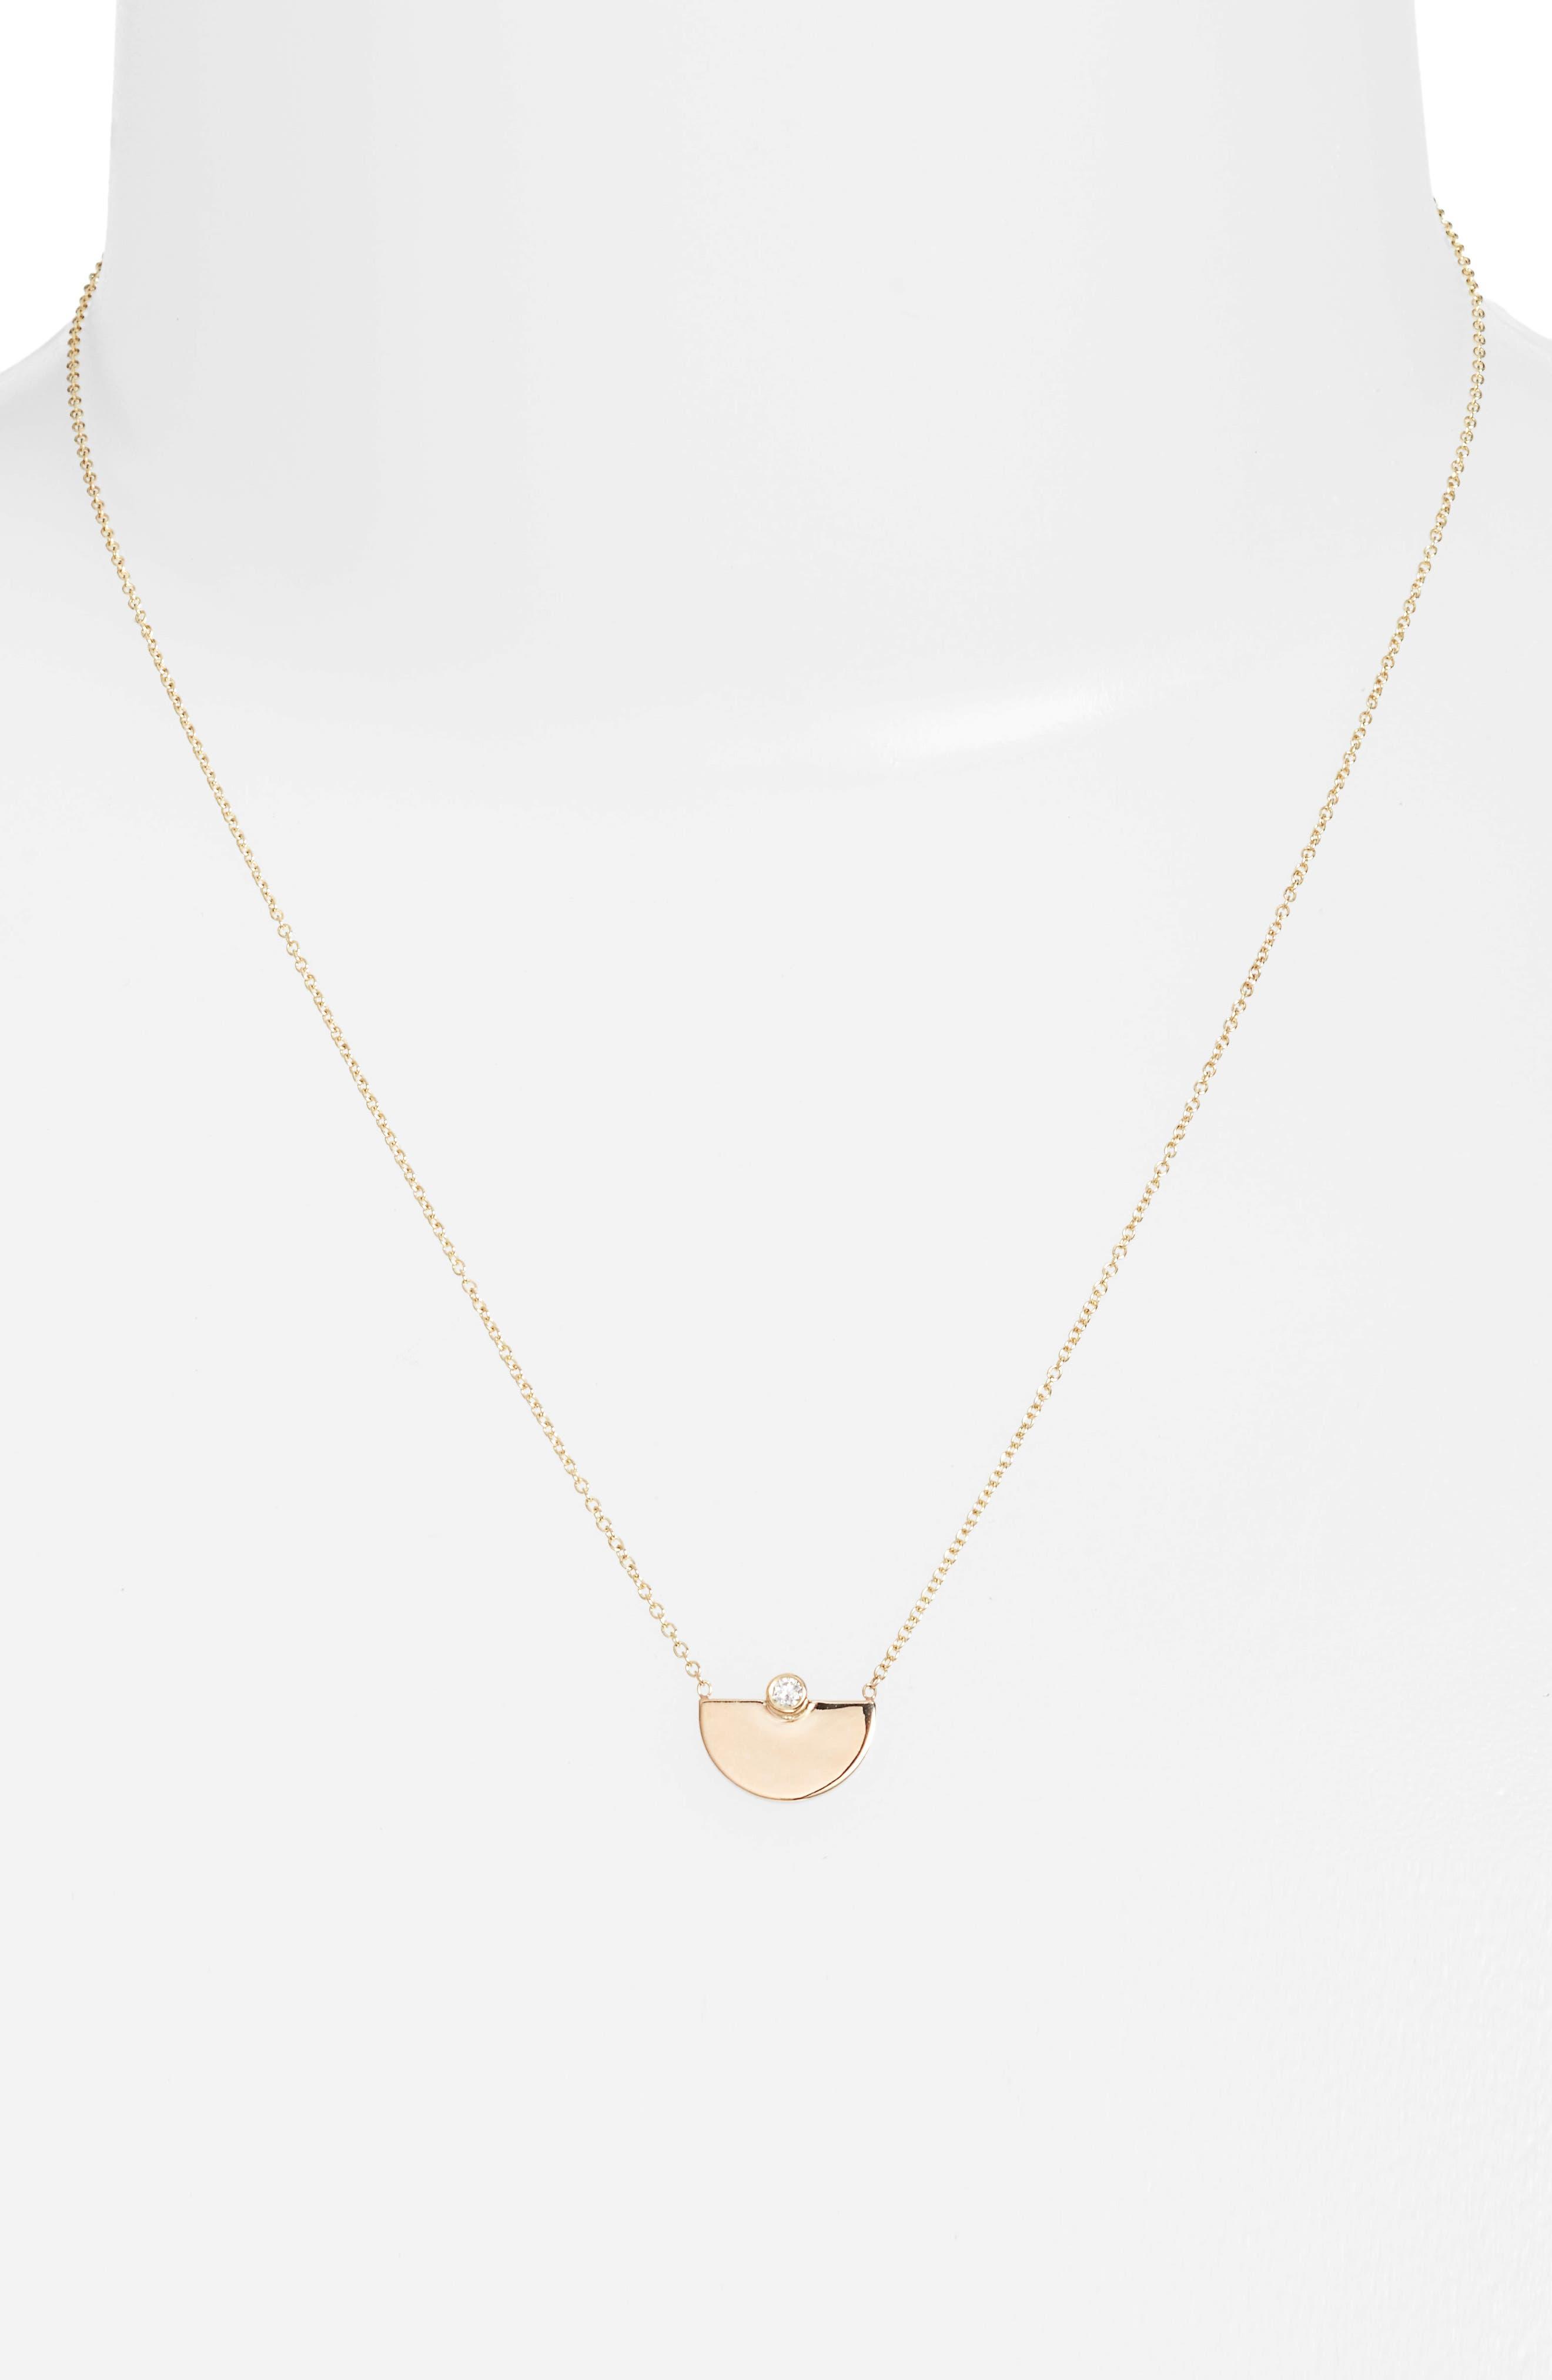 Zoë Chicco Horizon Diamond Pendant Necklace